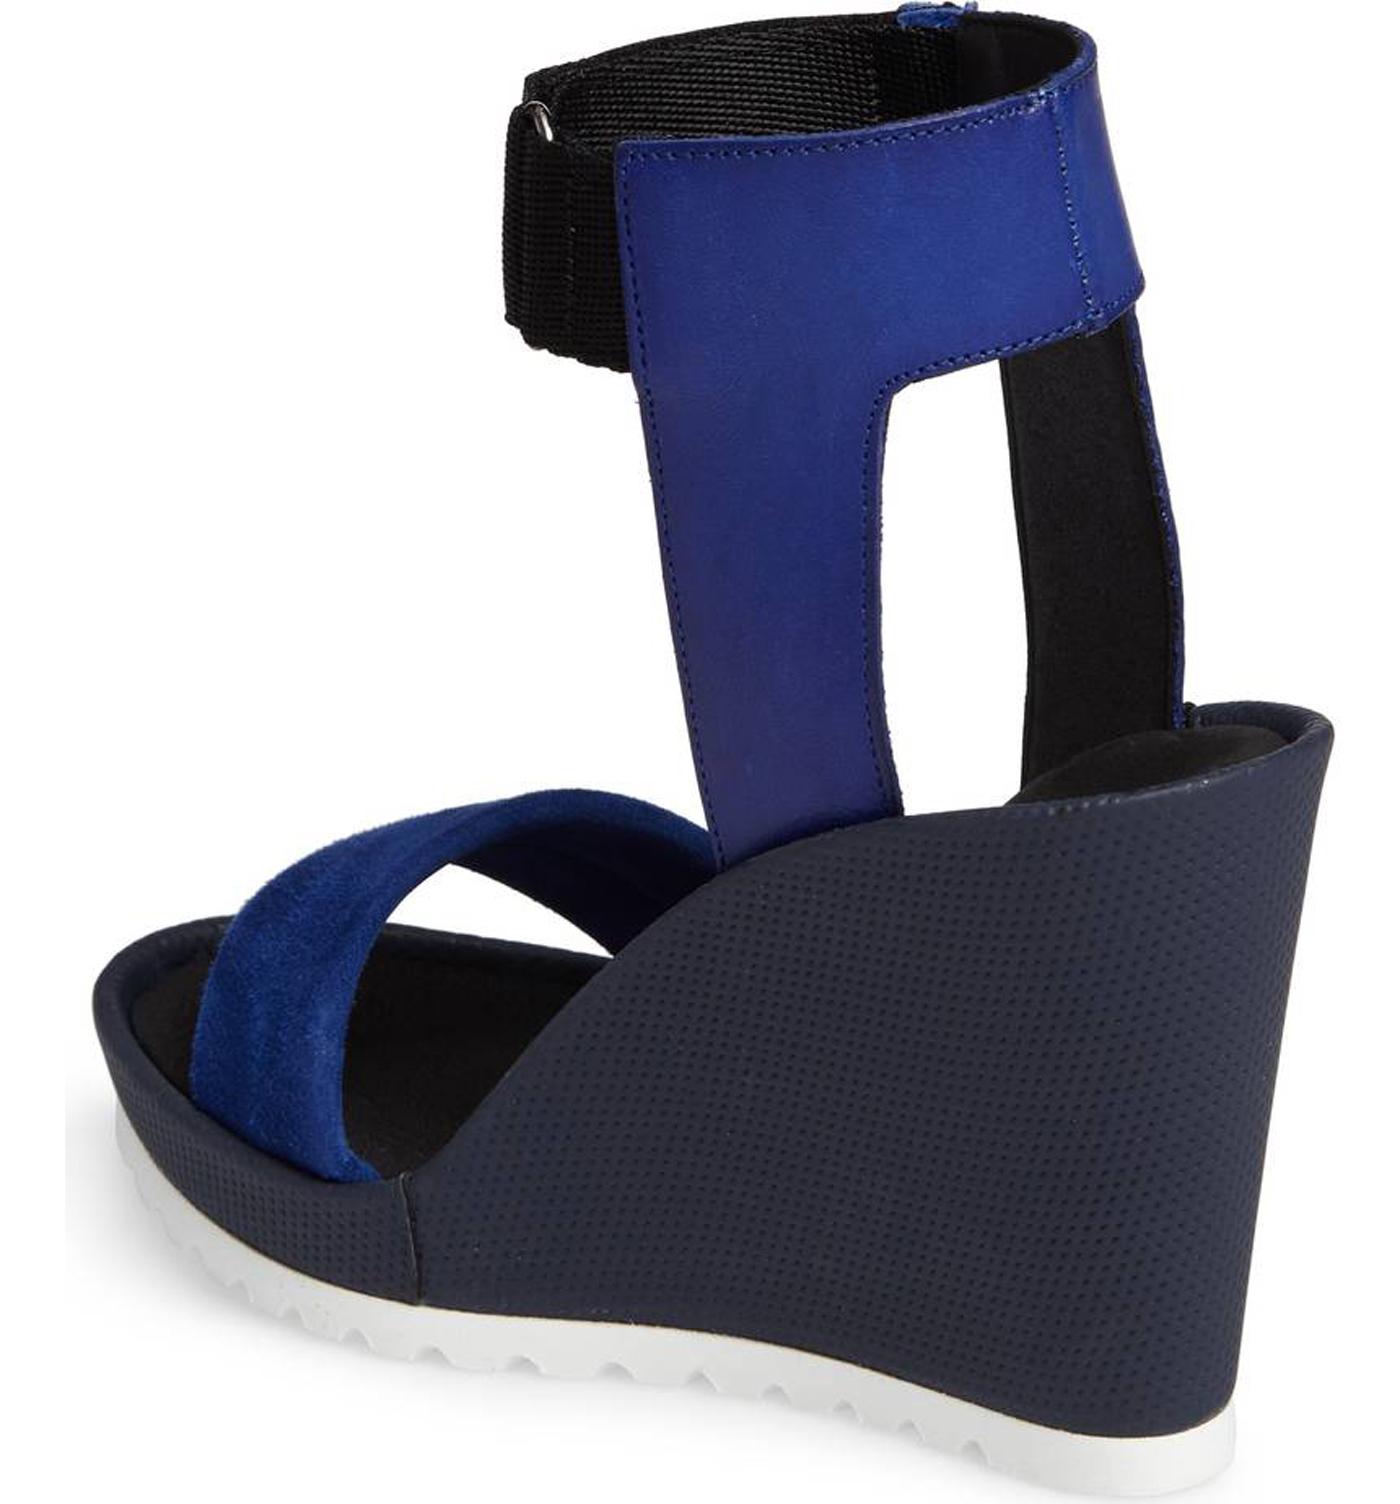 e408574fea7 Shellys London Kayleigh Blue Multi Suede Ankle Strap Platform Retro ...